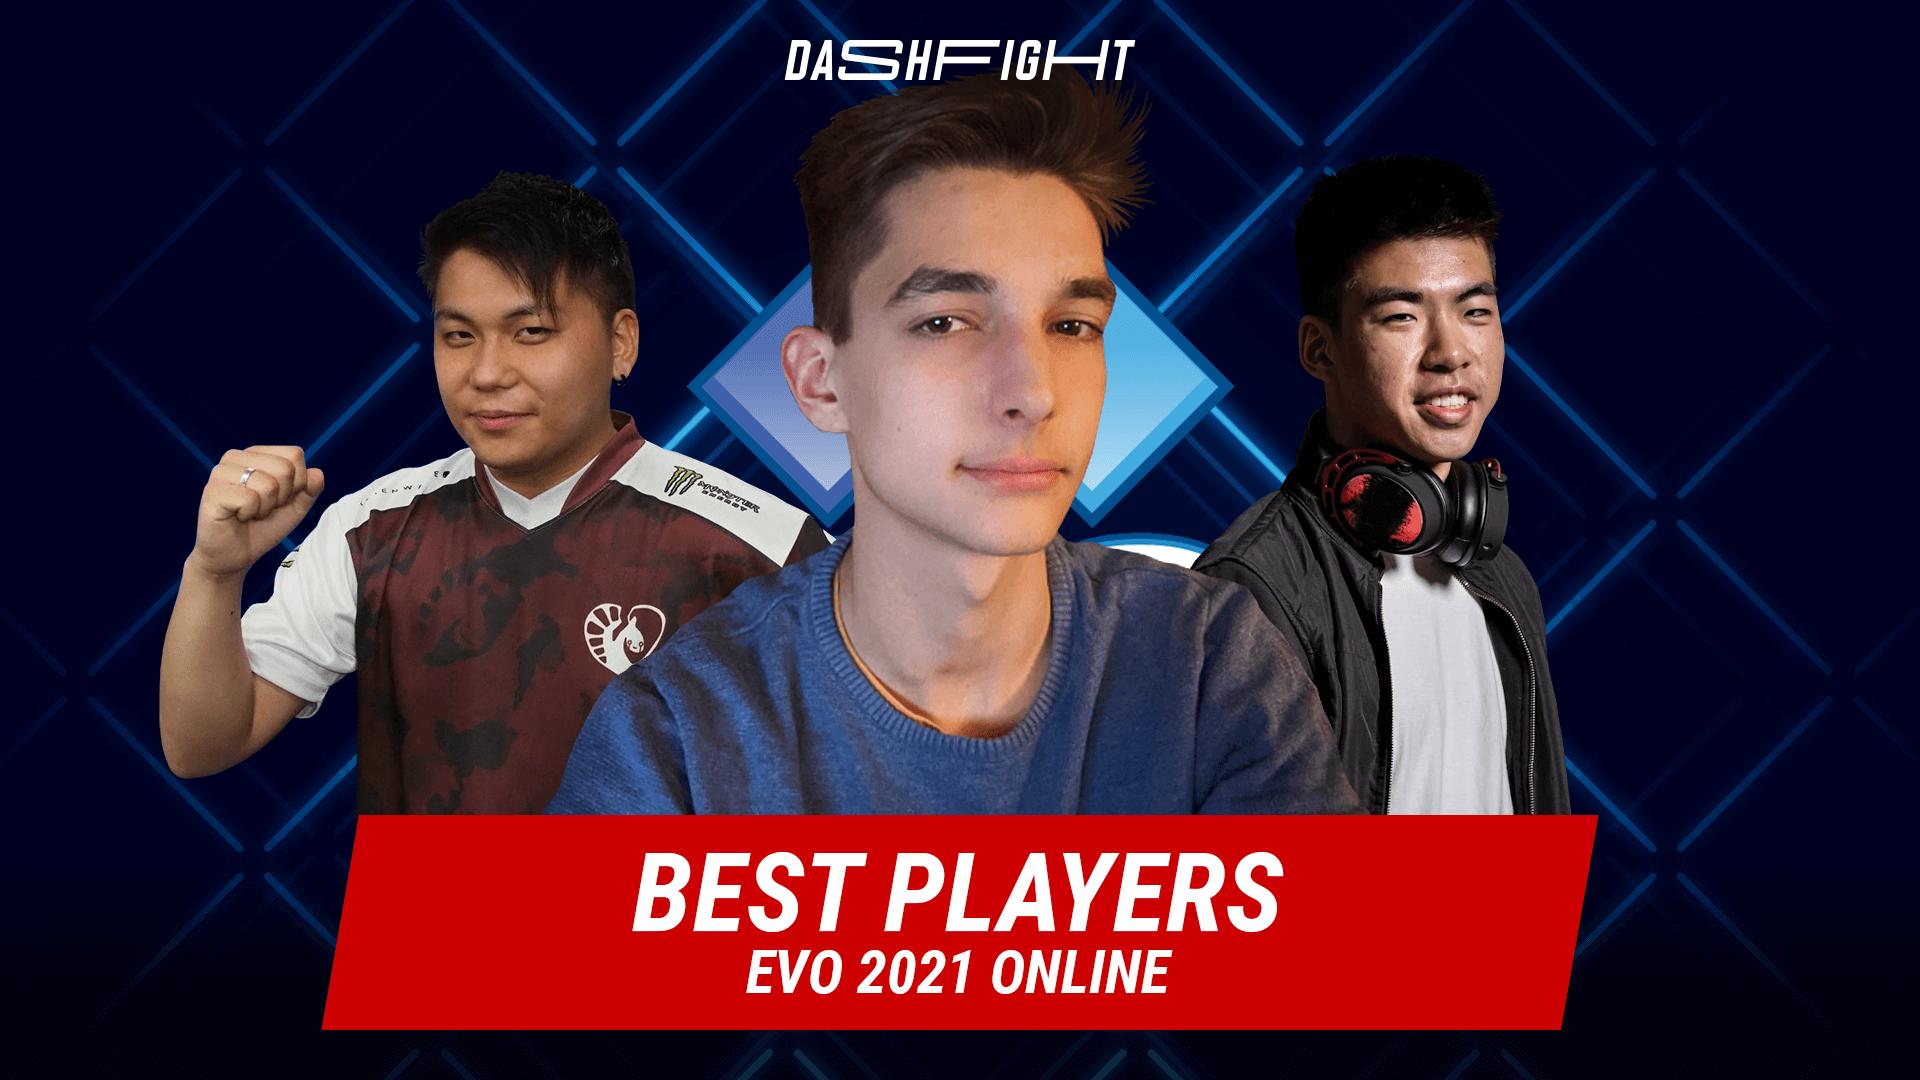 Evo 2021 Online: Best Players